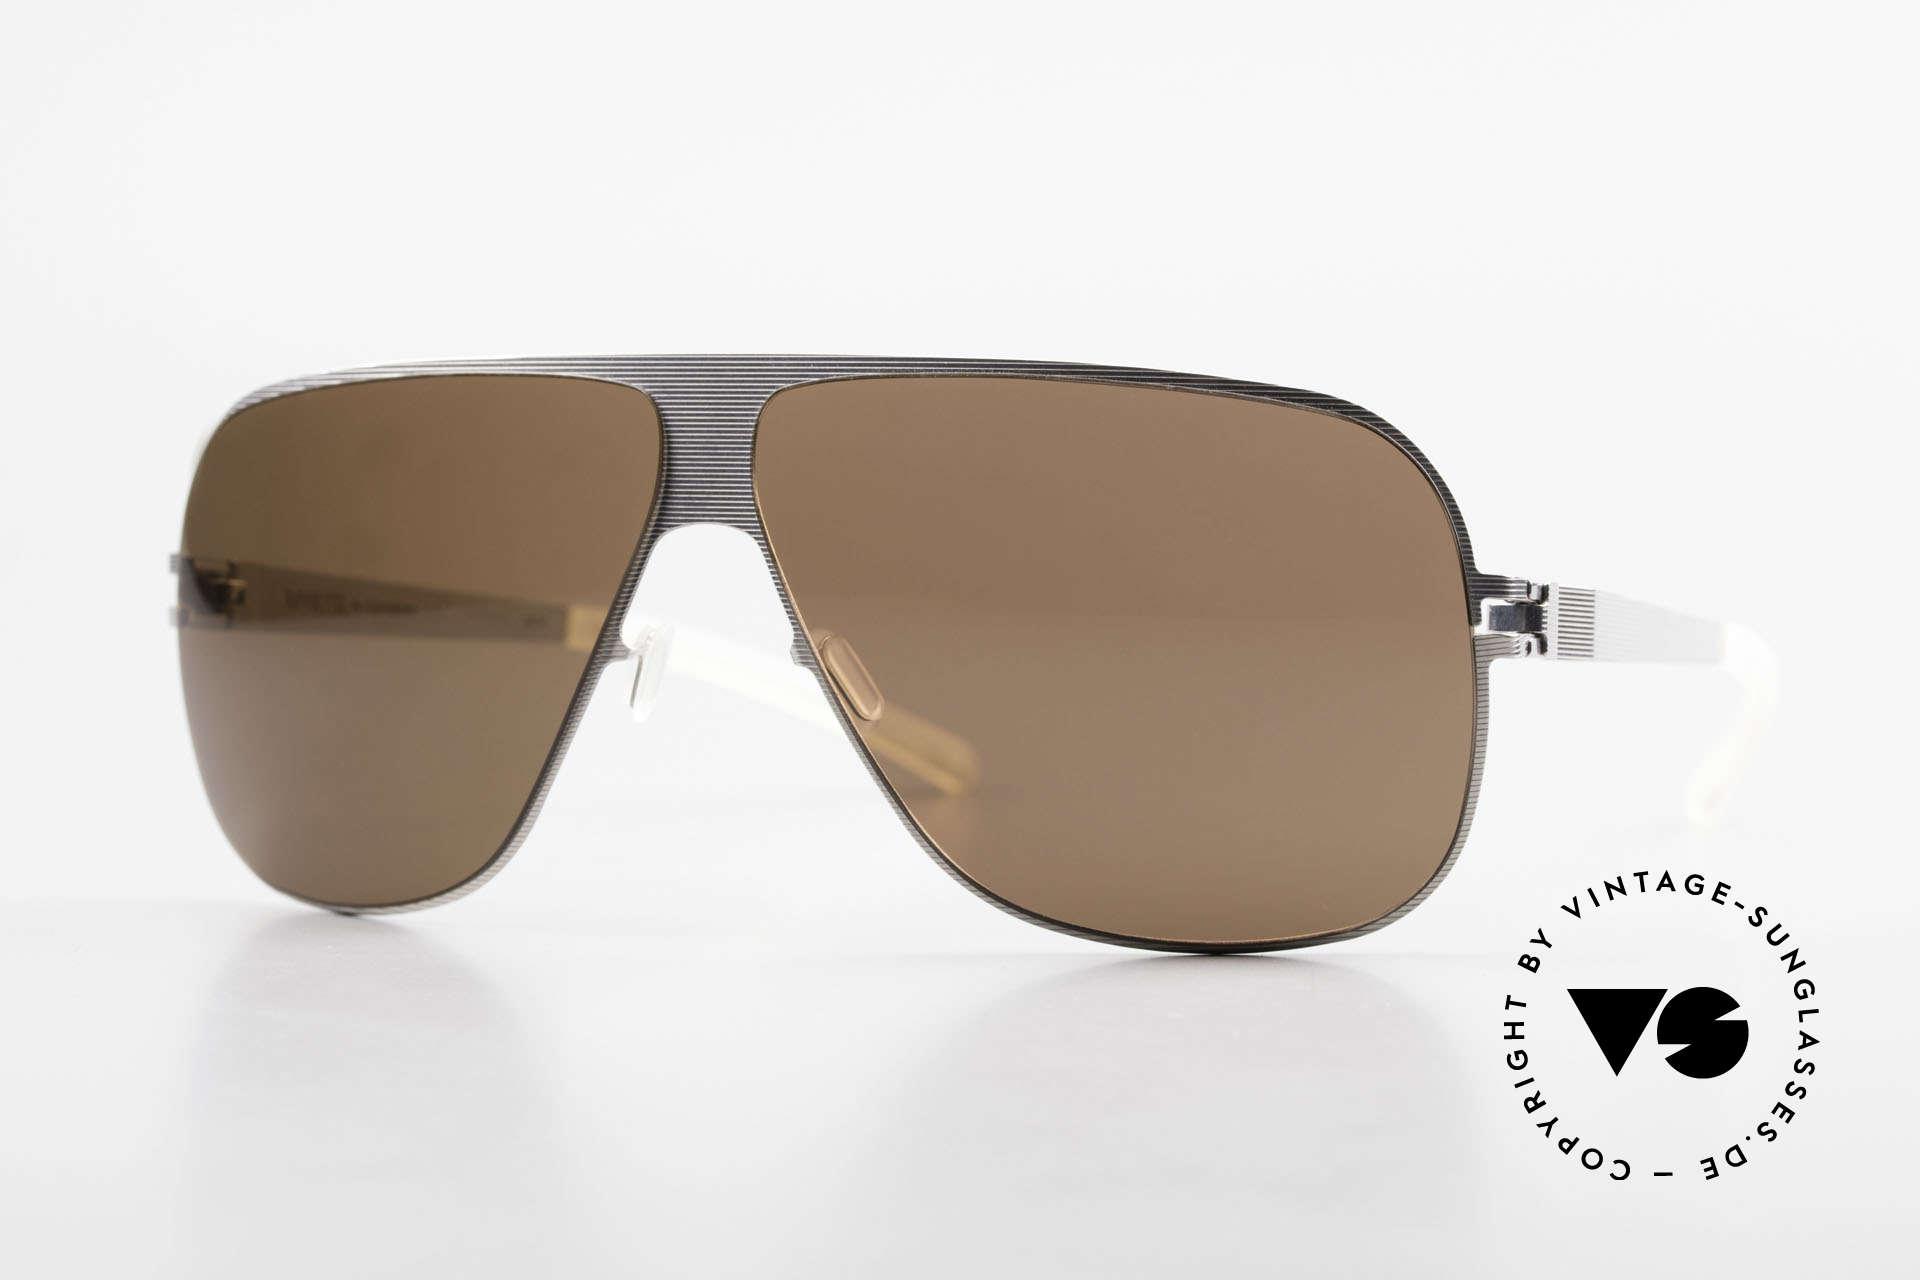 Mykita Hector Aviator Men's Sunglasses 2009's, original VINTAGE Mykita aviator sunglasses from 2009, Made for Men